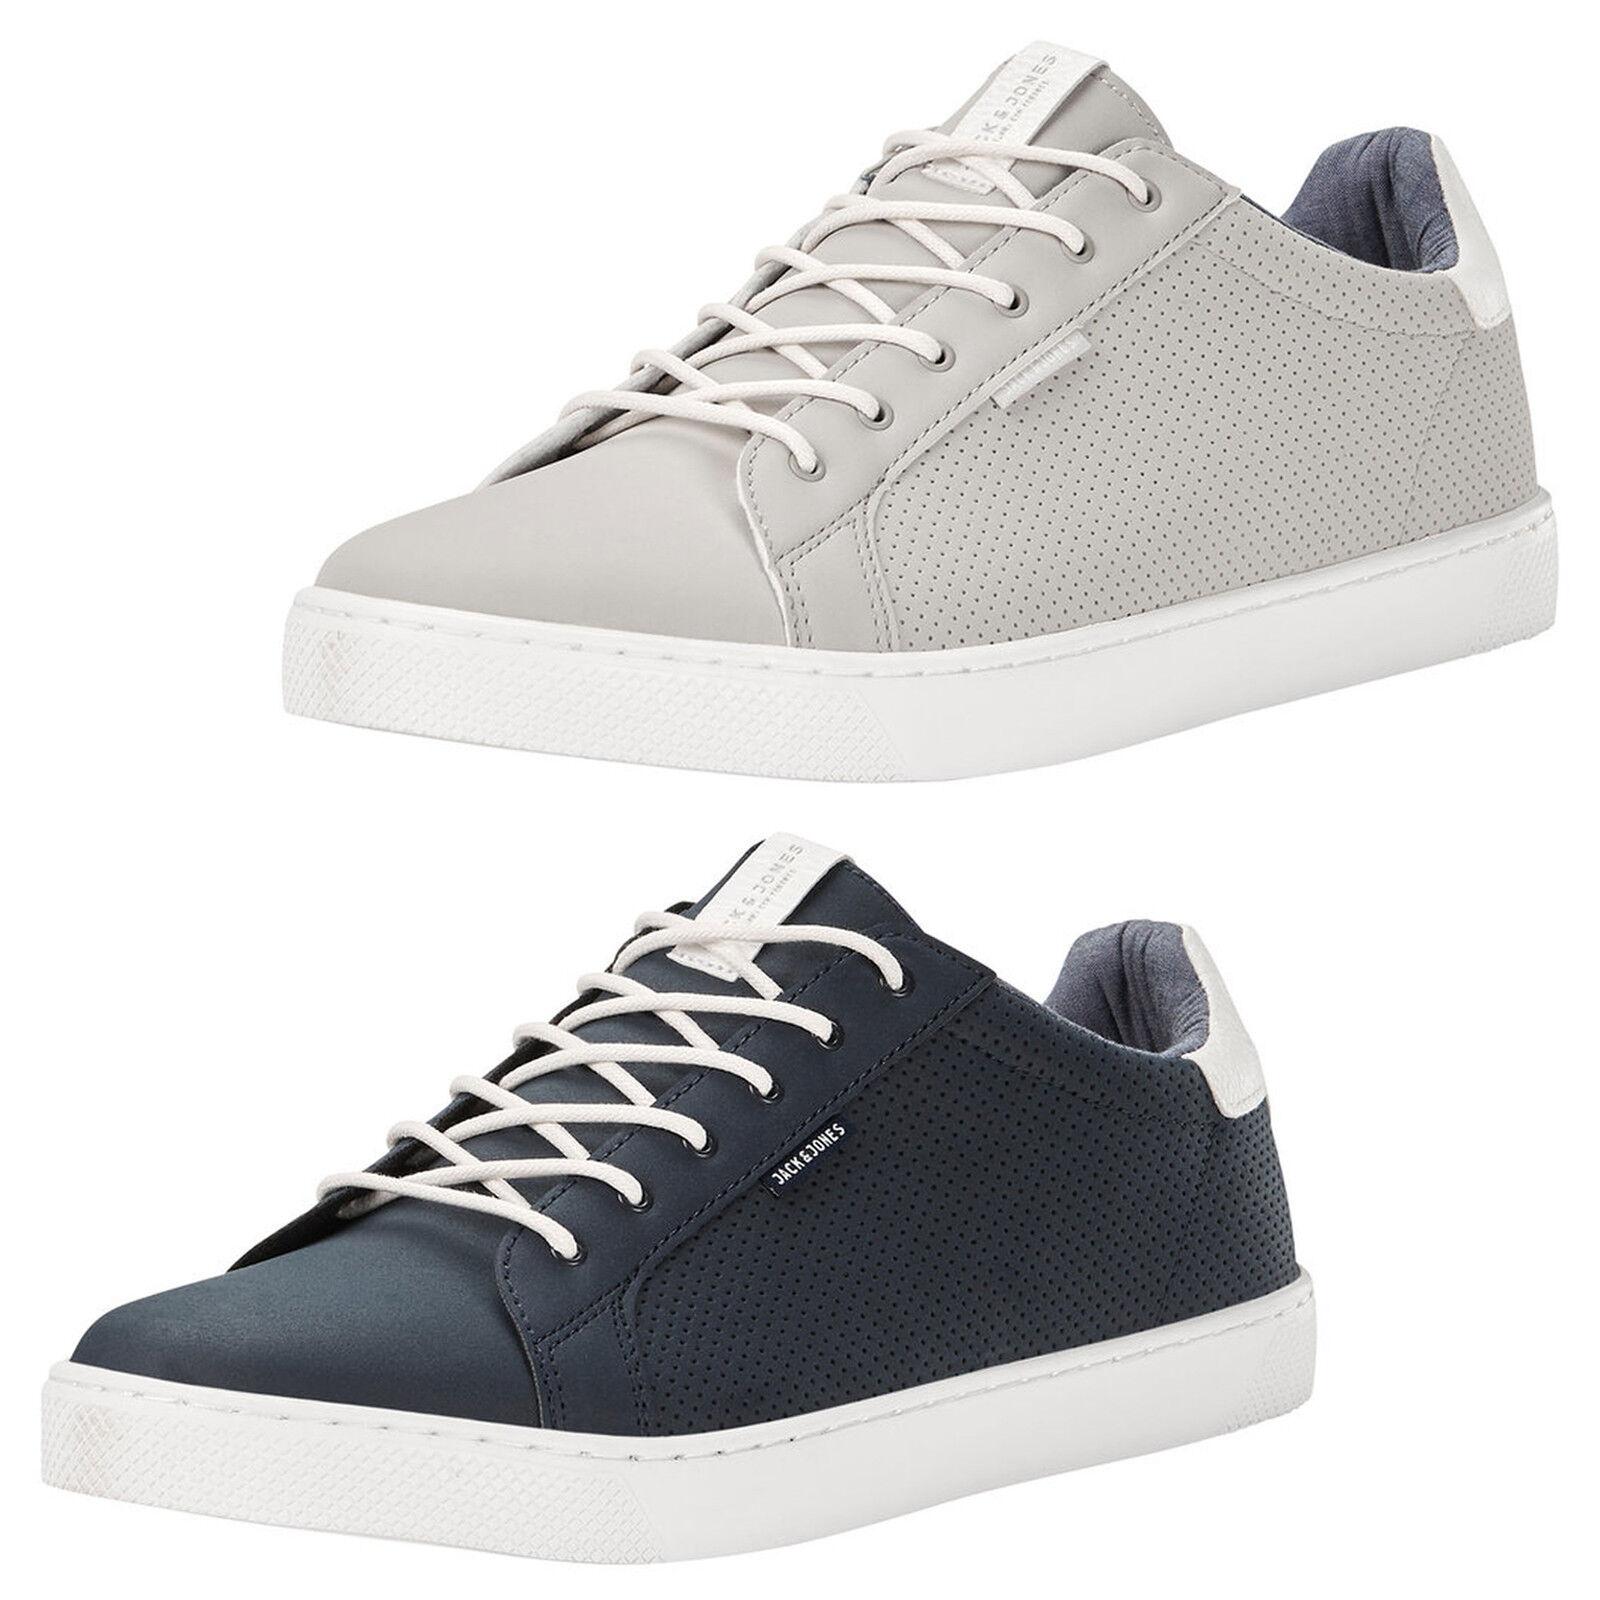 Jack Jones Trent Trainers Mens Summer Fashion Casual scarpe  da ginnastica Scarpe  Garanzia di vestibilità al 100%